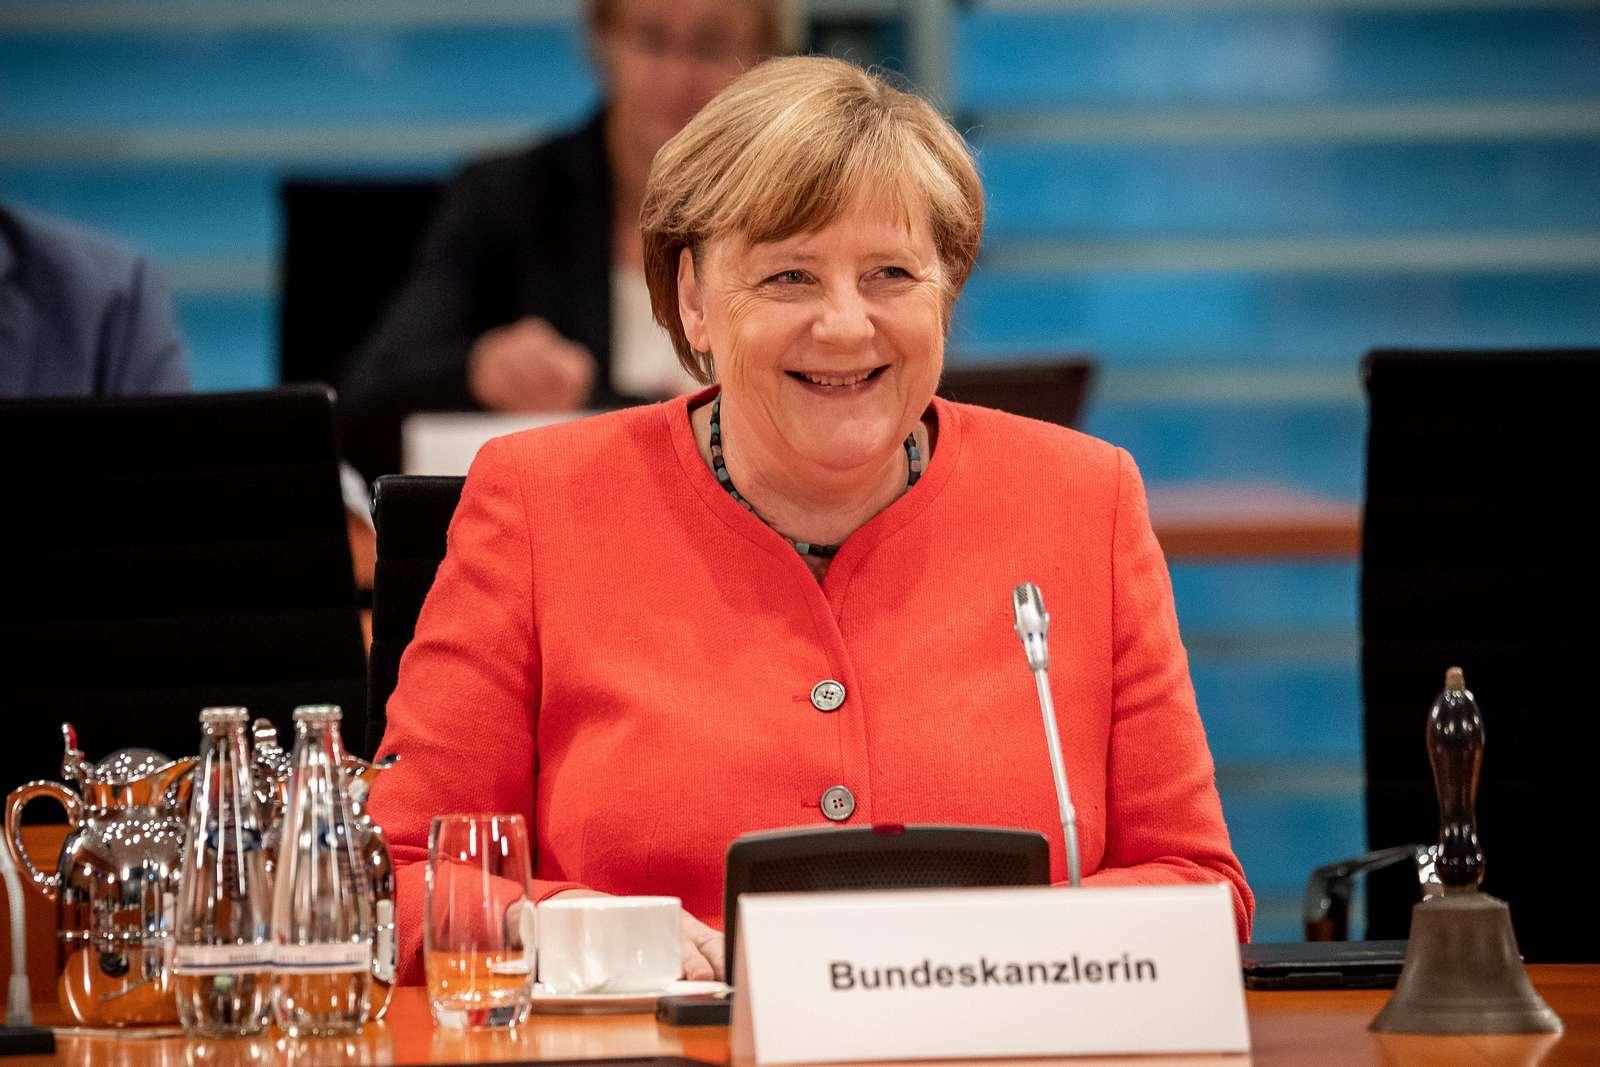 Bundeskanzlerin Angela Merkel E Mail Adresse